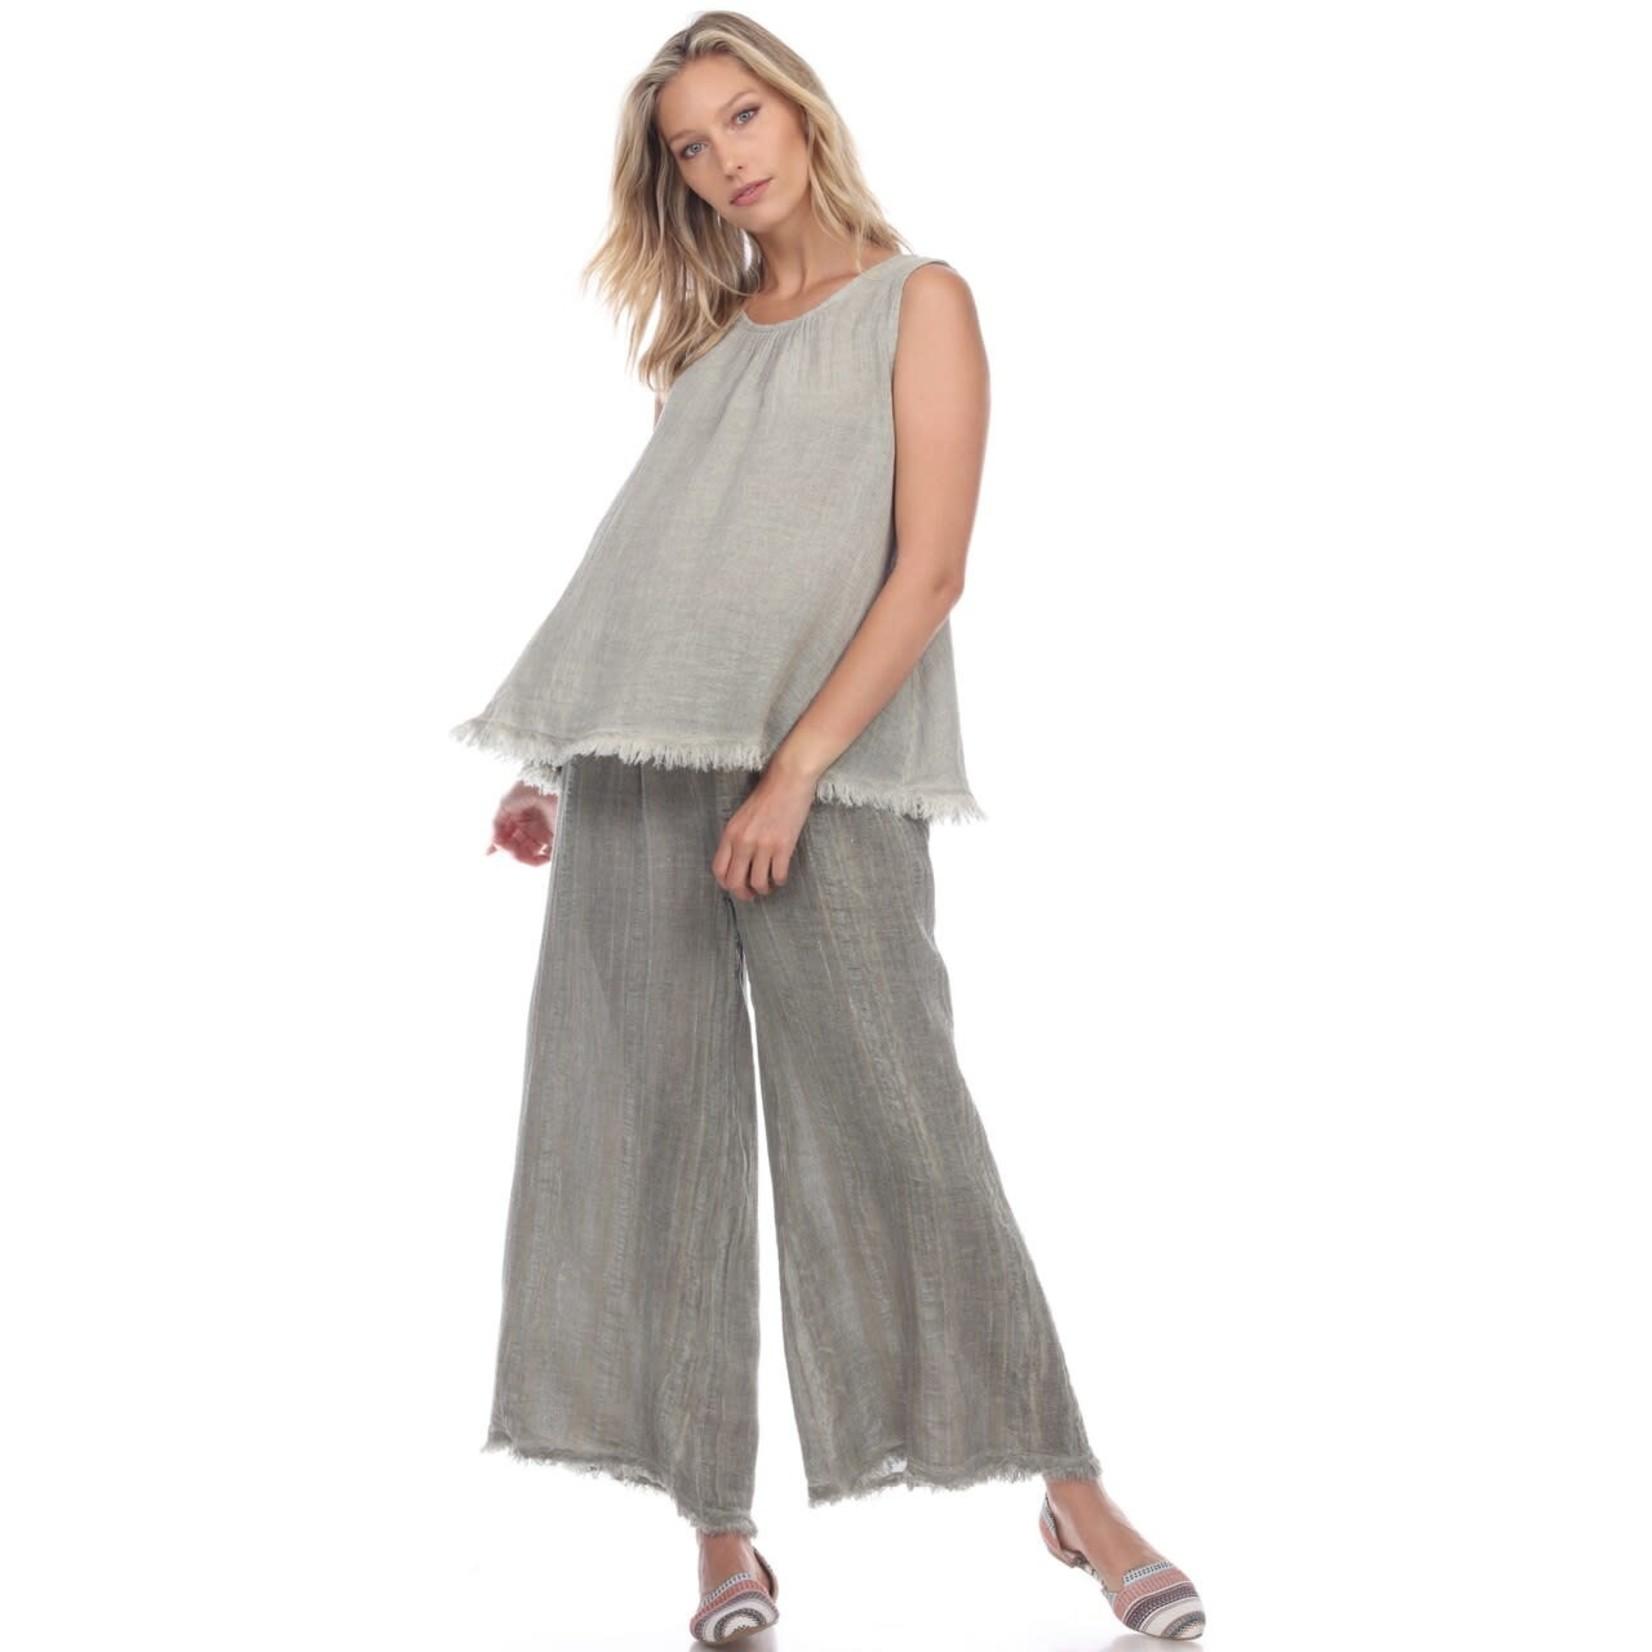 Flora Ashley Sage Textured Linen Pants w/ Fringe Bottom